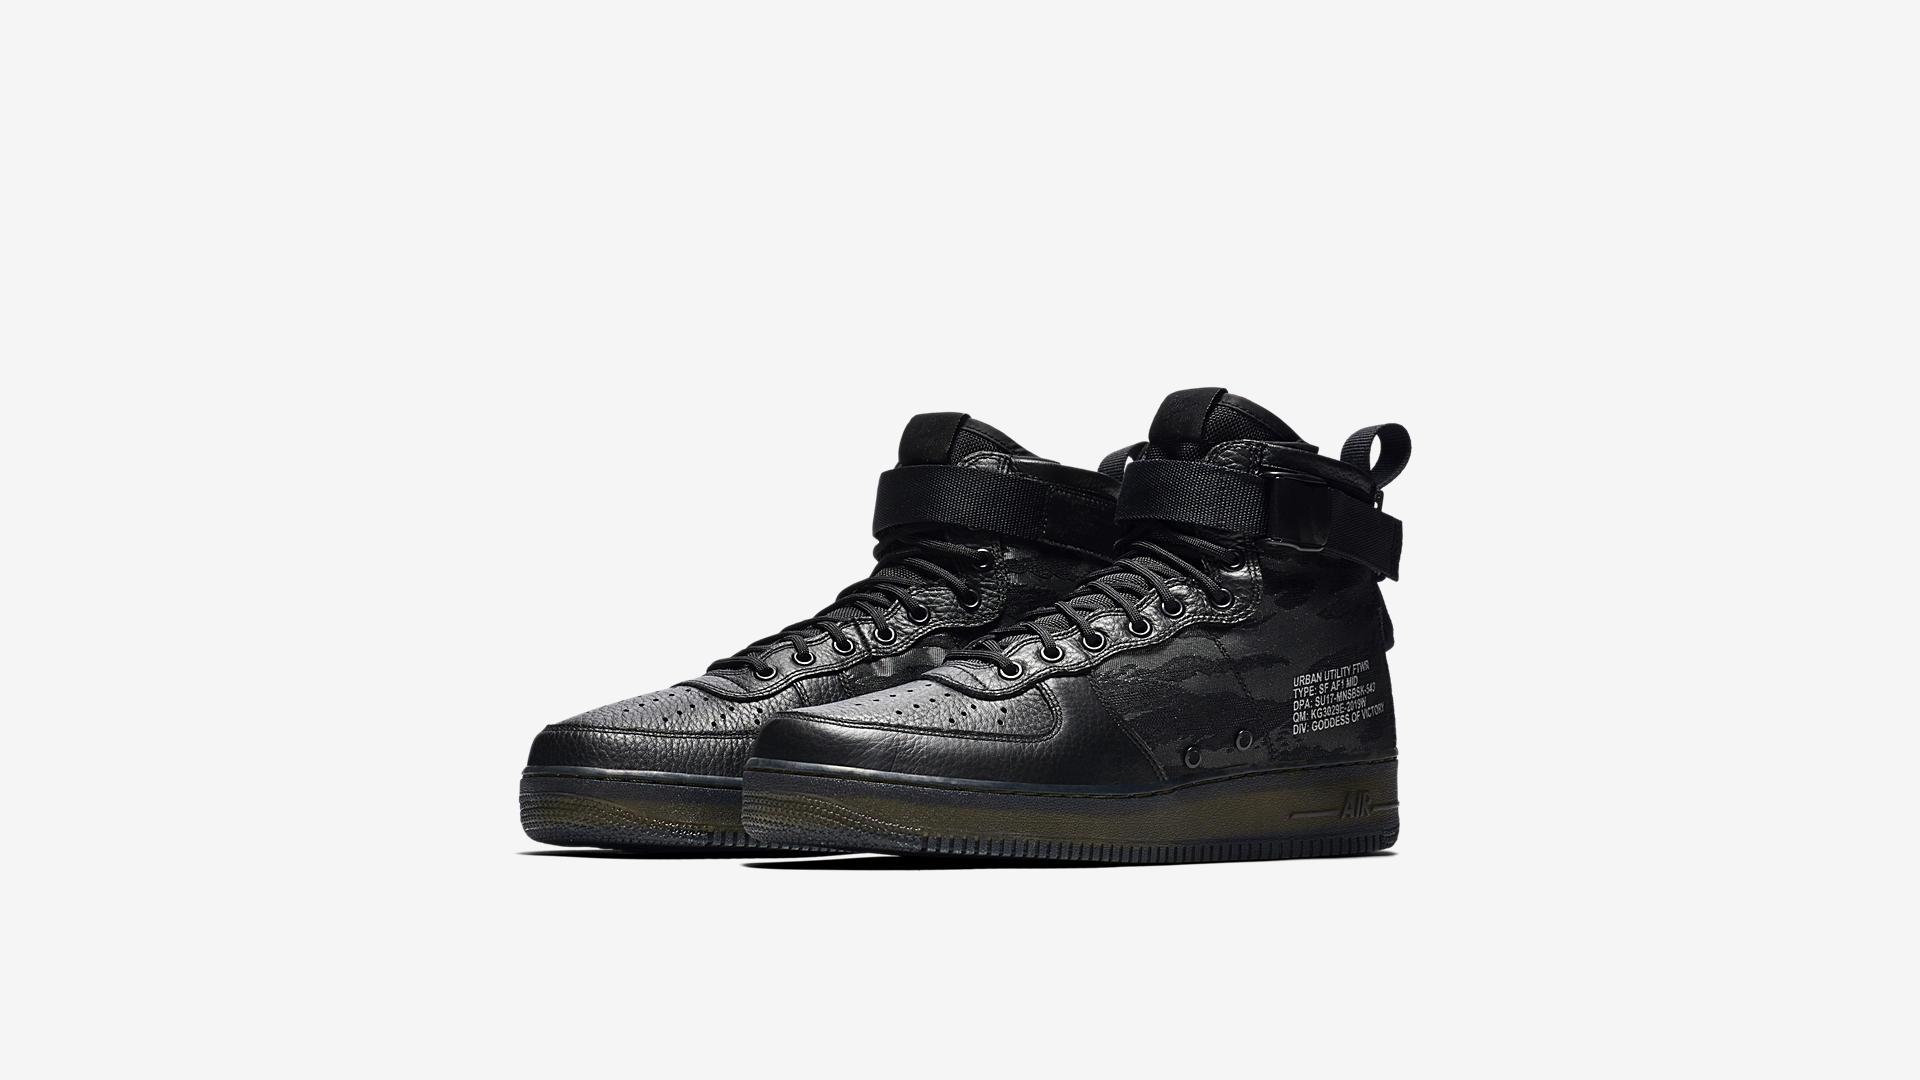 Nike SF Air Force 1 Mid Black Cargo Khaki AA7345 001 3